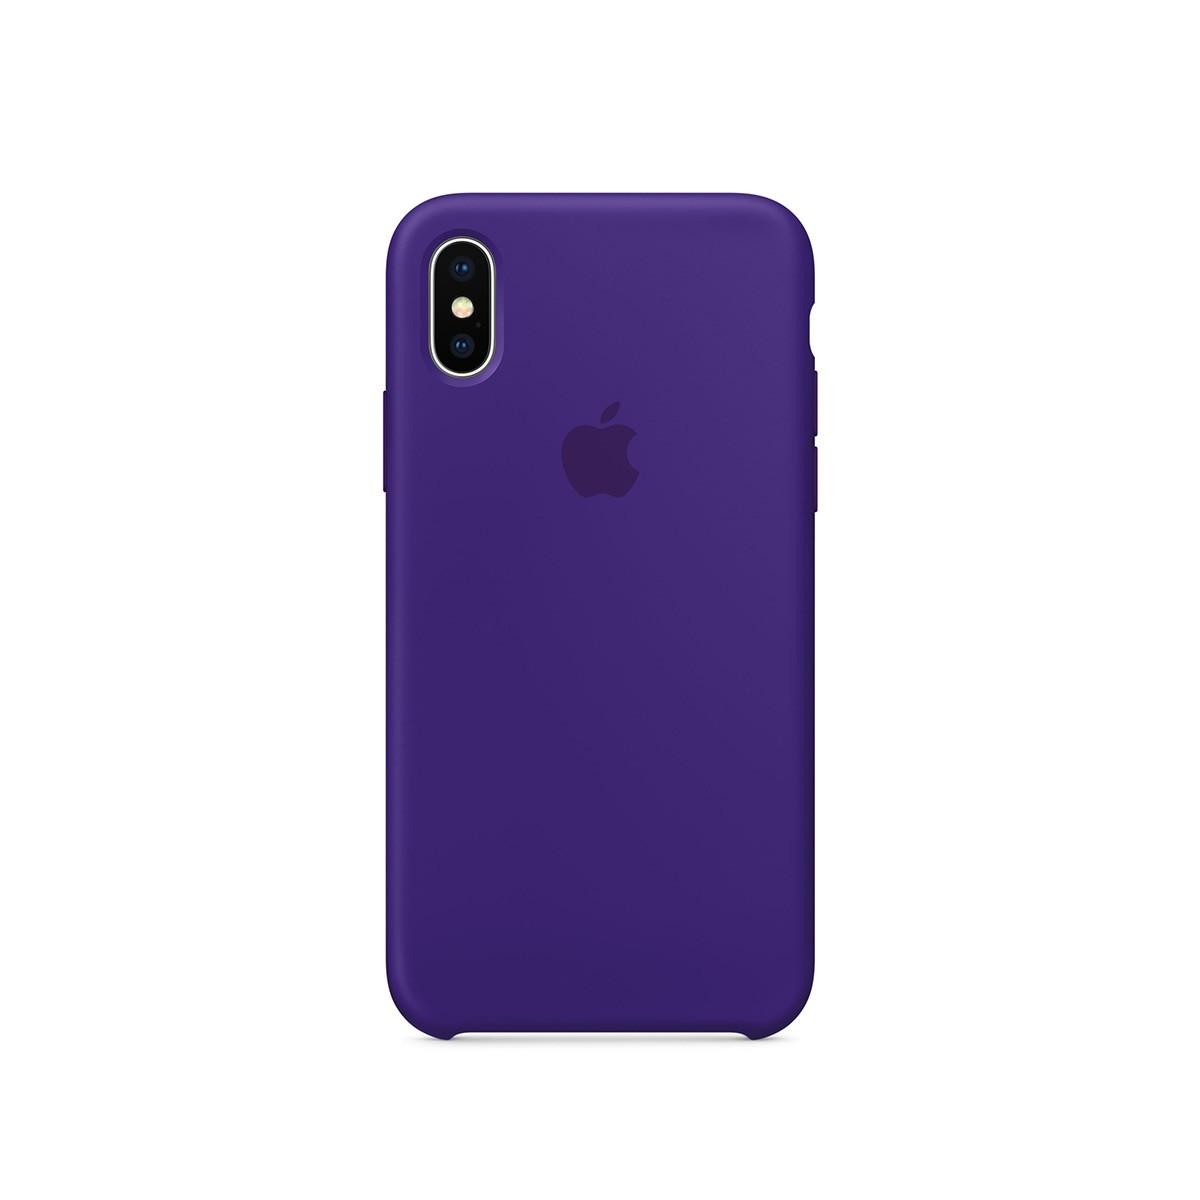 Apple silikonový kryt na iPhone X – tmavě fialový